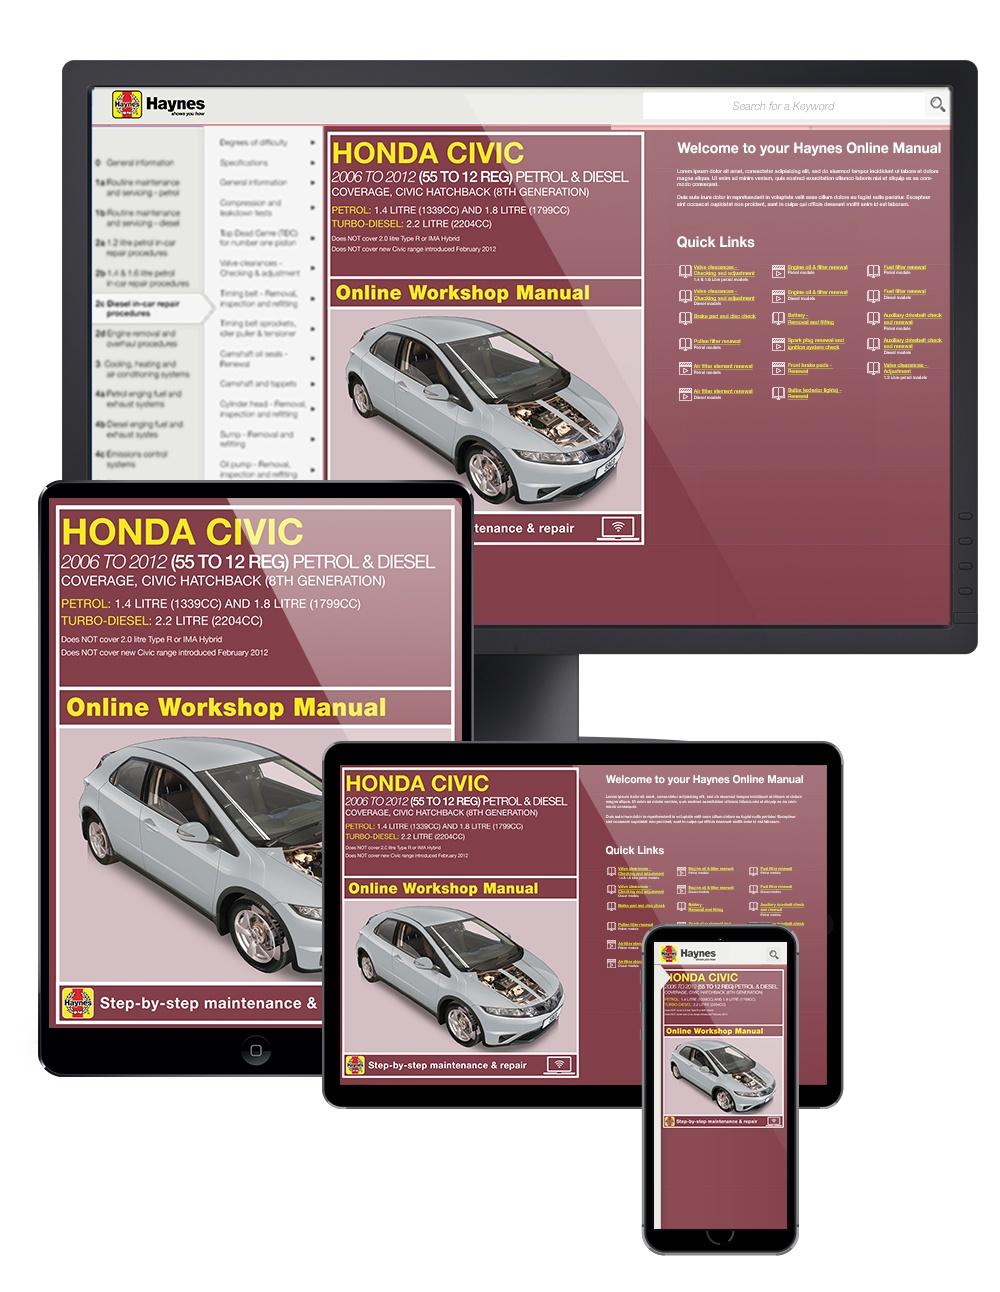 Honda Civic Petrol & Diesel (2006-2013) Haynes Online Manual